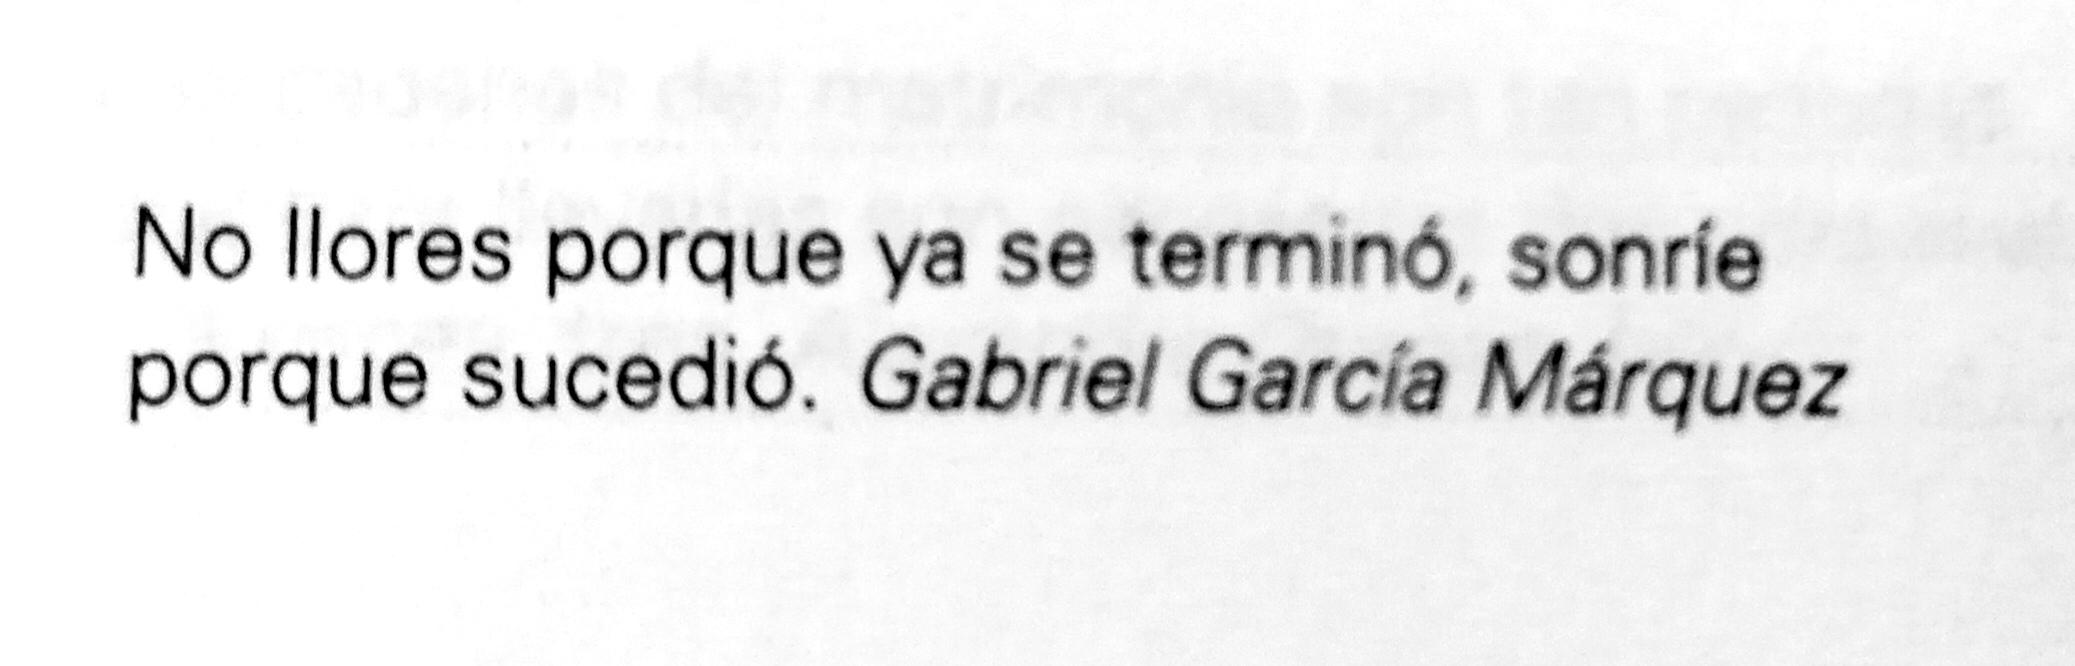 Frase de Gabriel García Márquez